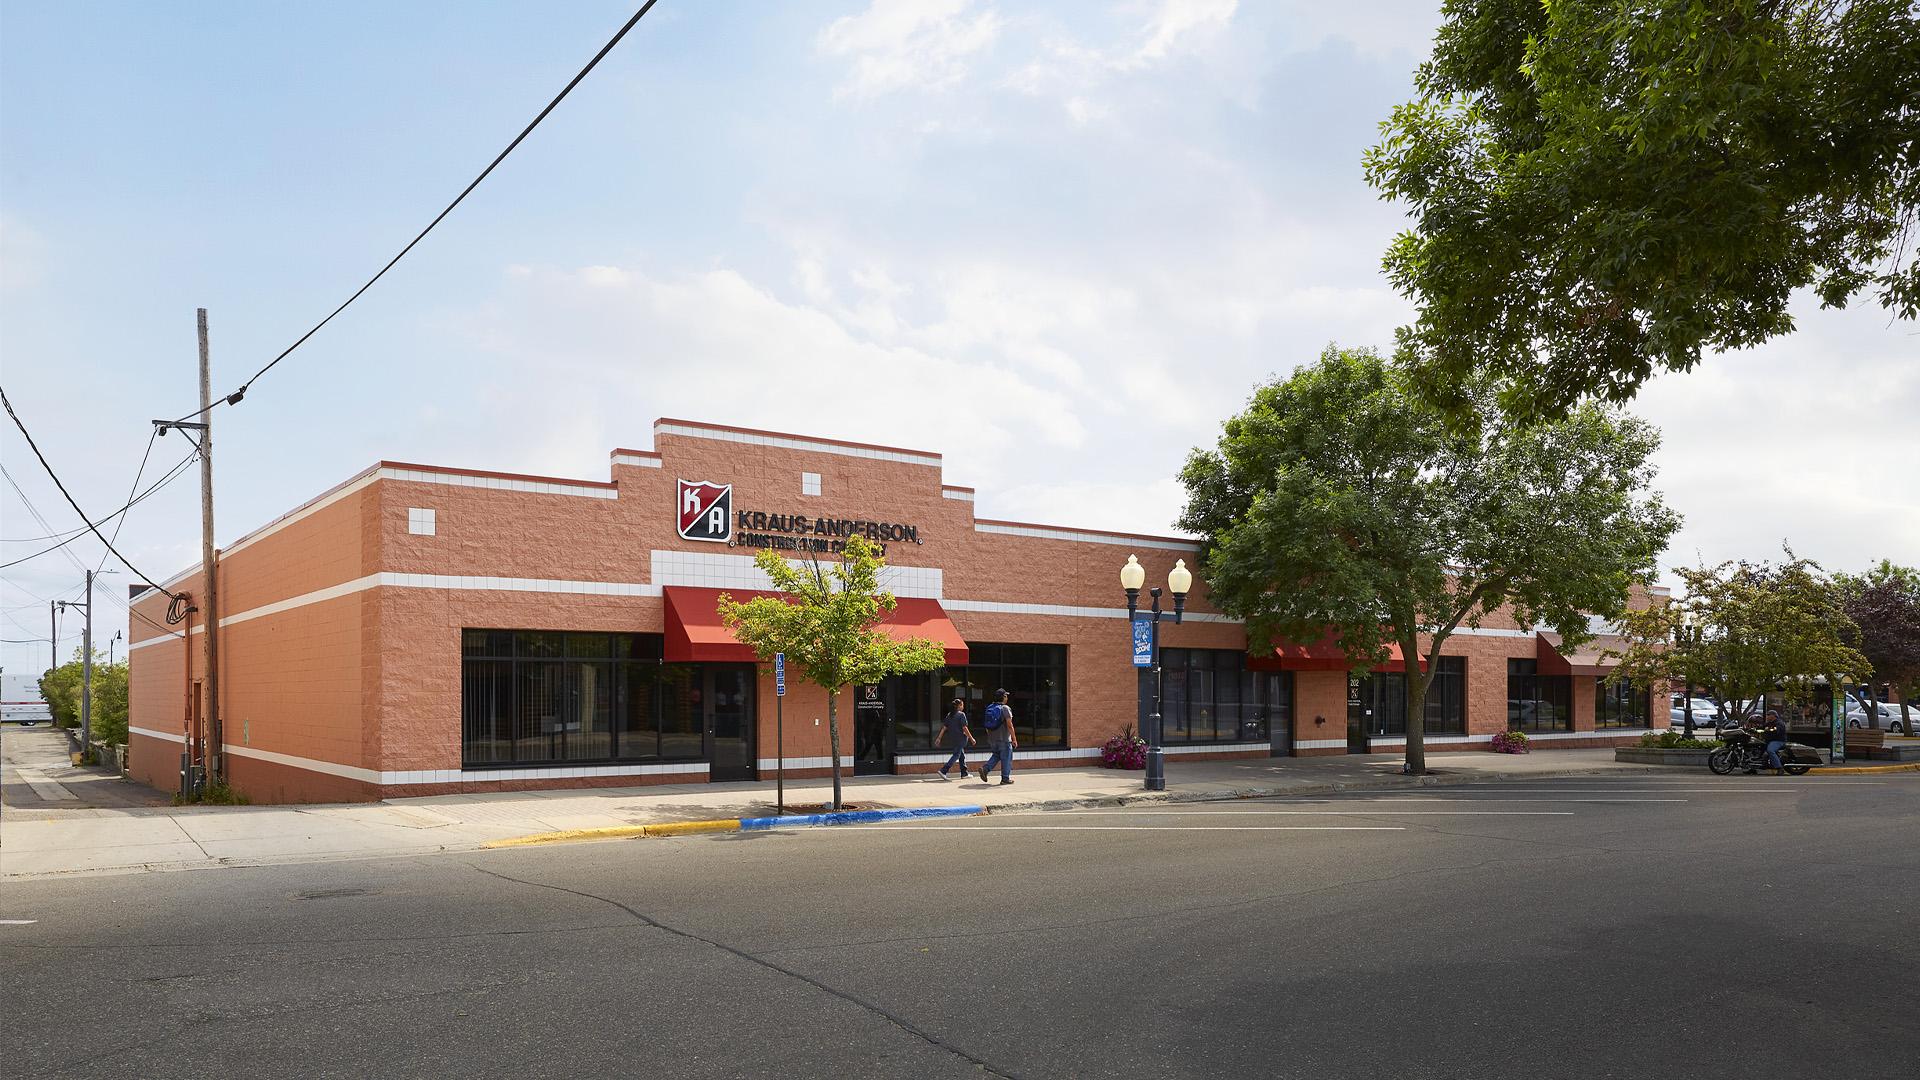 Union Square Shopping Center Bemidji MN building on 2nd and Beltrami Facing Beltrami home of KA Realty